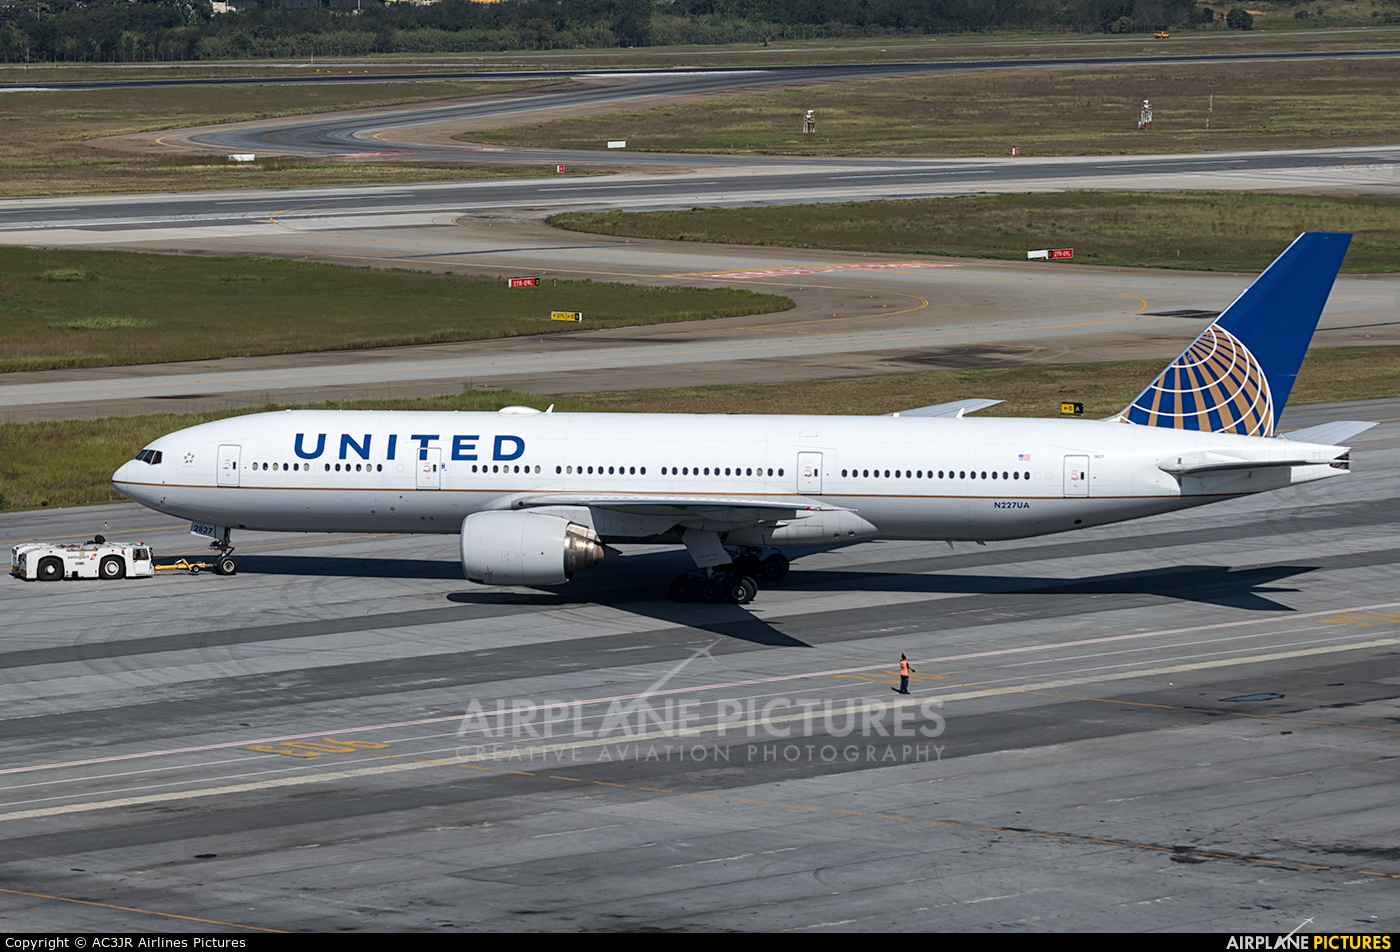 United Airlines N227UA aircraft at São Paulo - Guarulhos